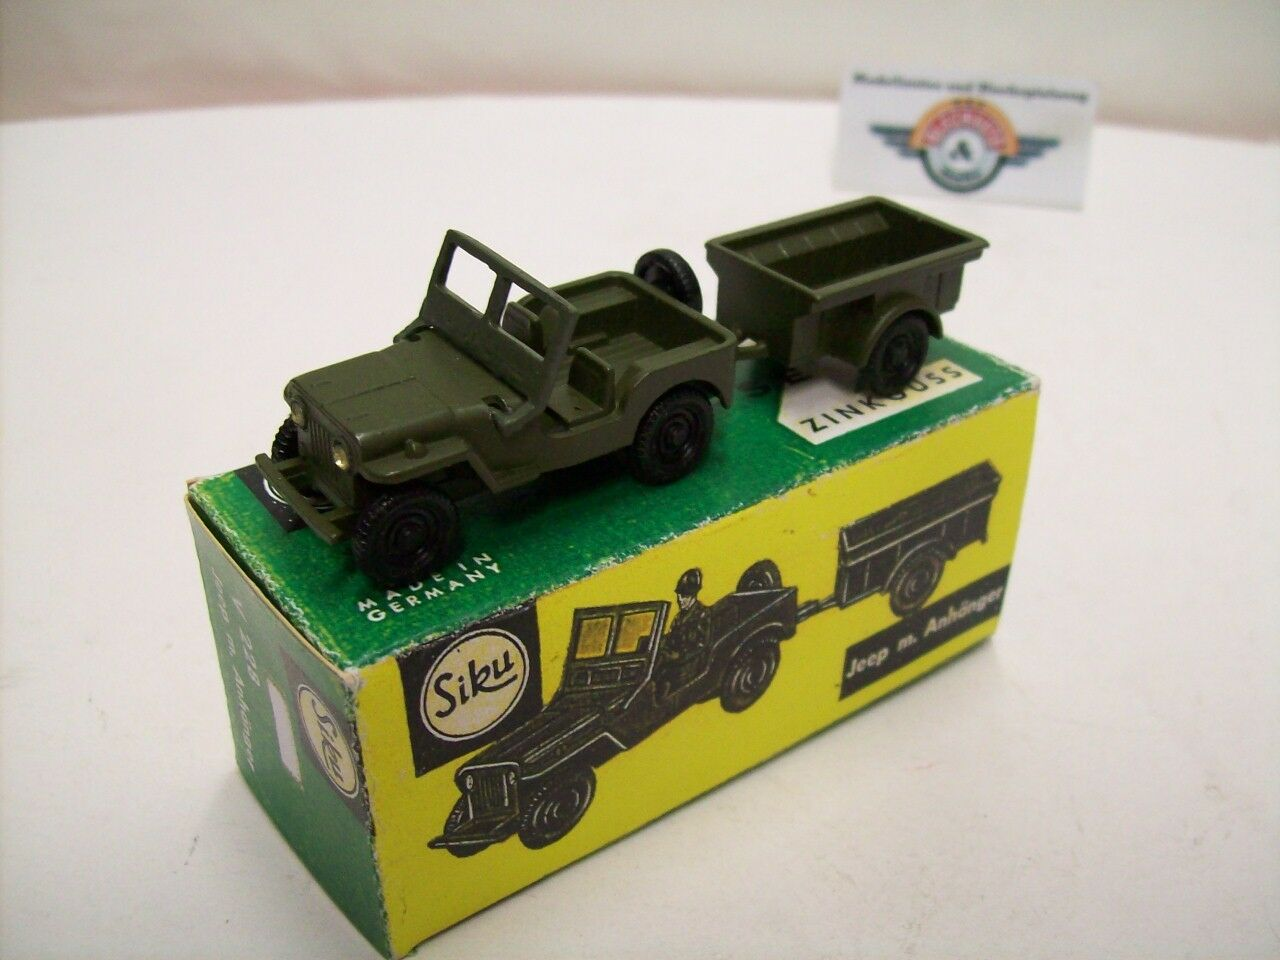 Siku V 226, Jeep Willýs with Trailer, 1945, Olive Green, Siku (Germany) 1 60